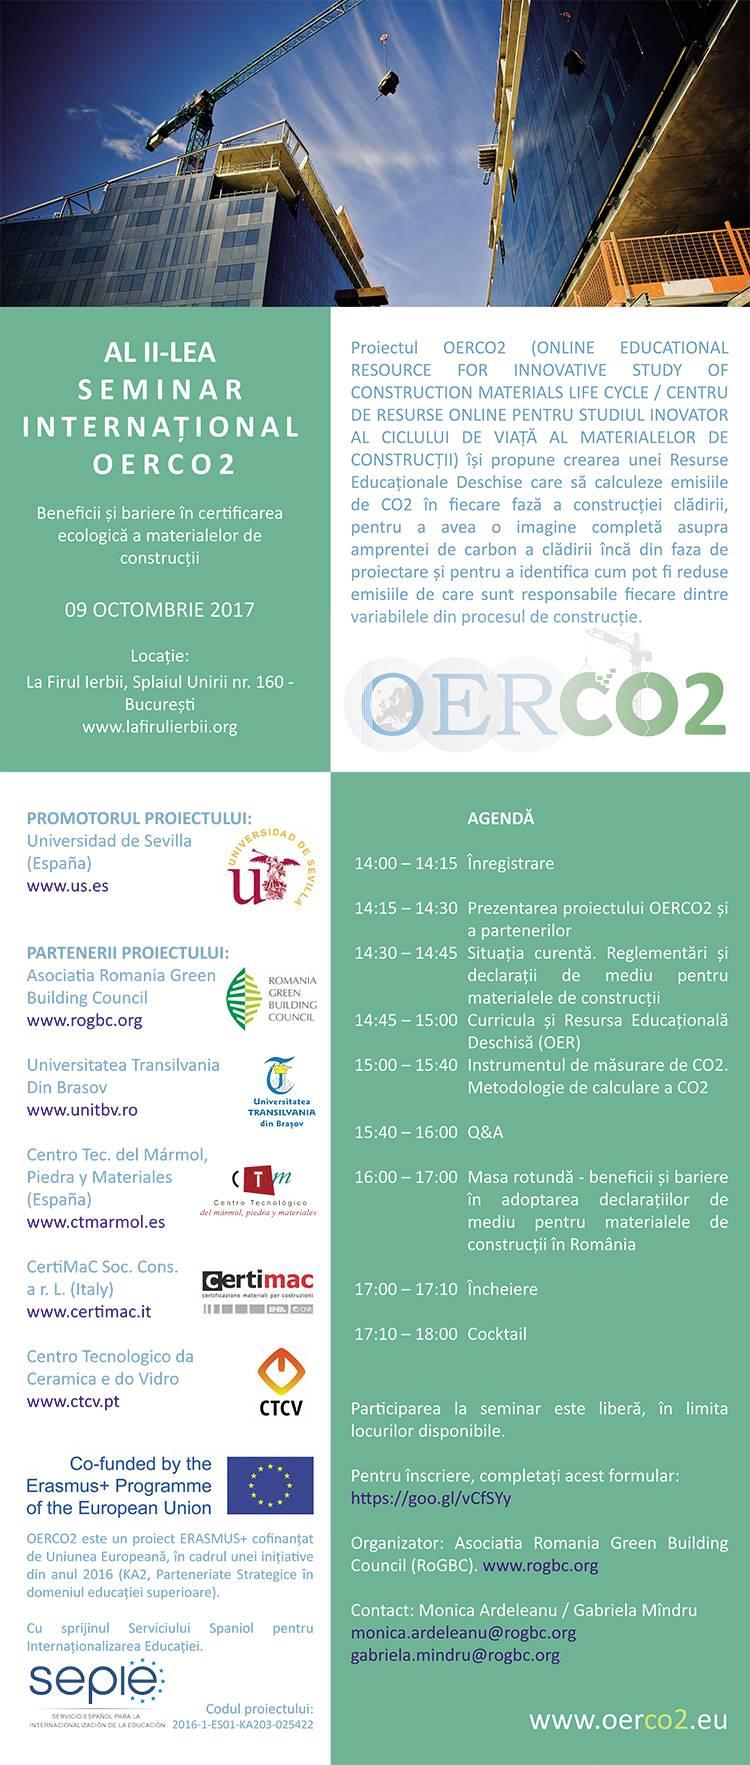 OERCO2 POSTER 2nd Seminario Int RO v5L